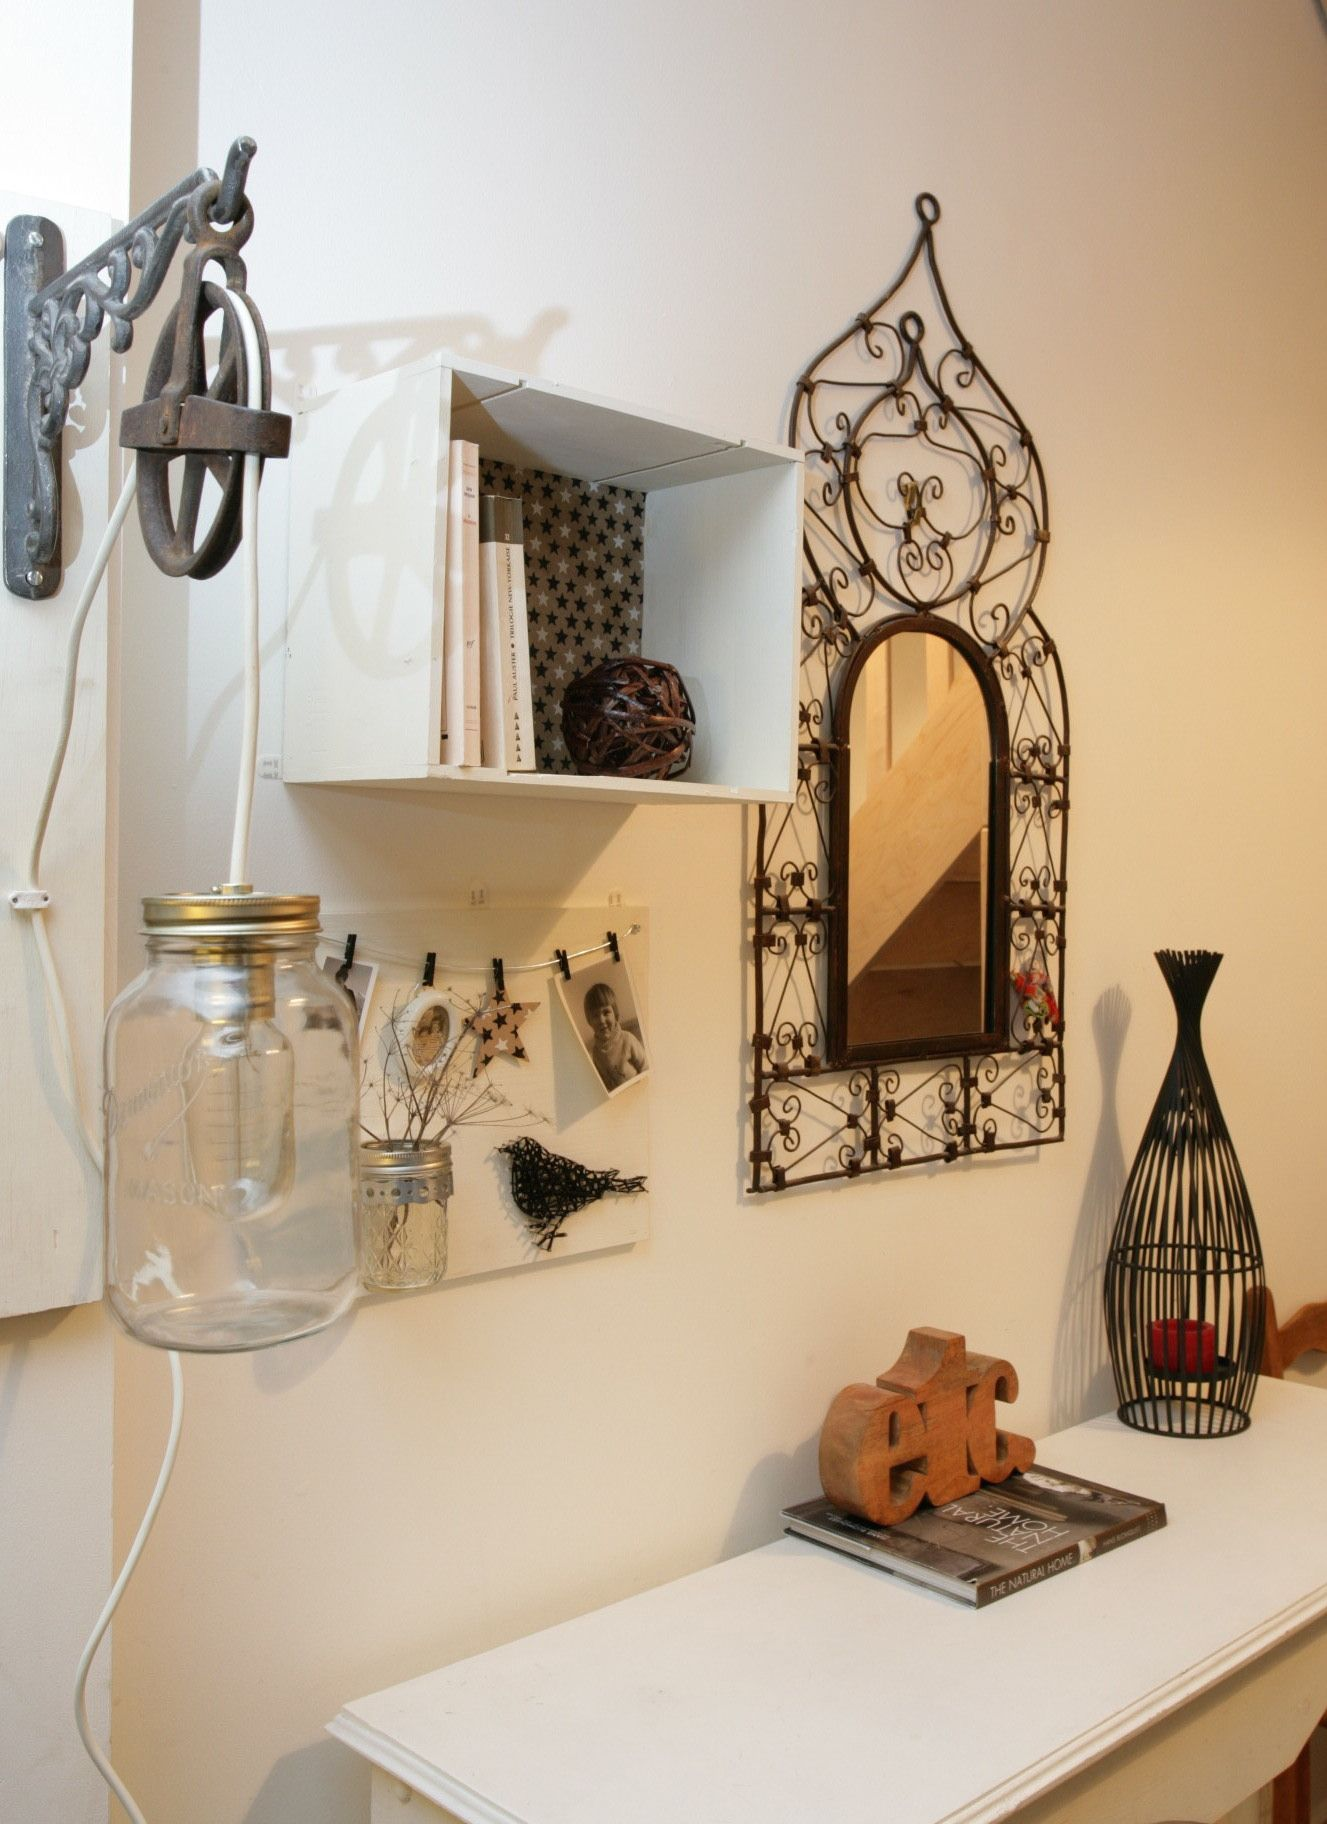 Diy Triptyque Rangement Luminaire Deco Murale Deco Murale Deco Deco Rangement